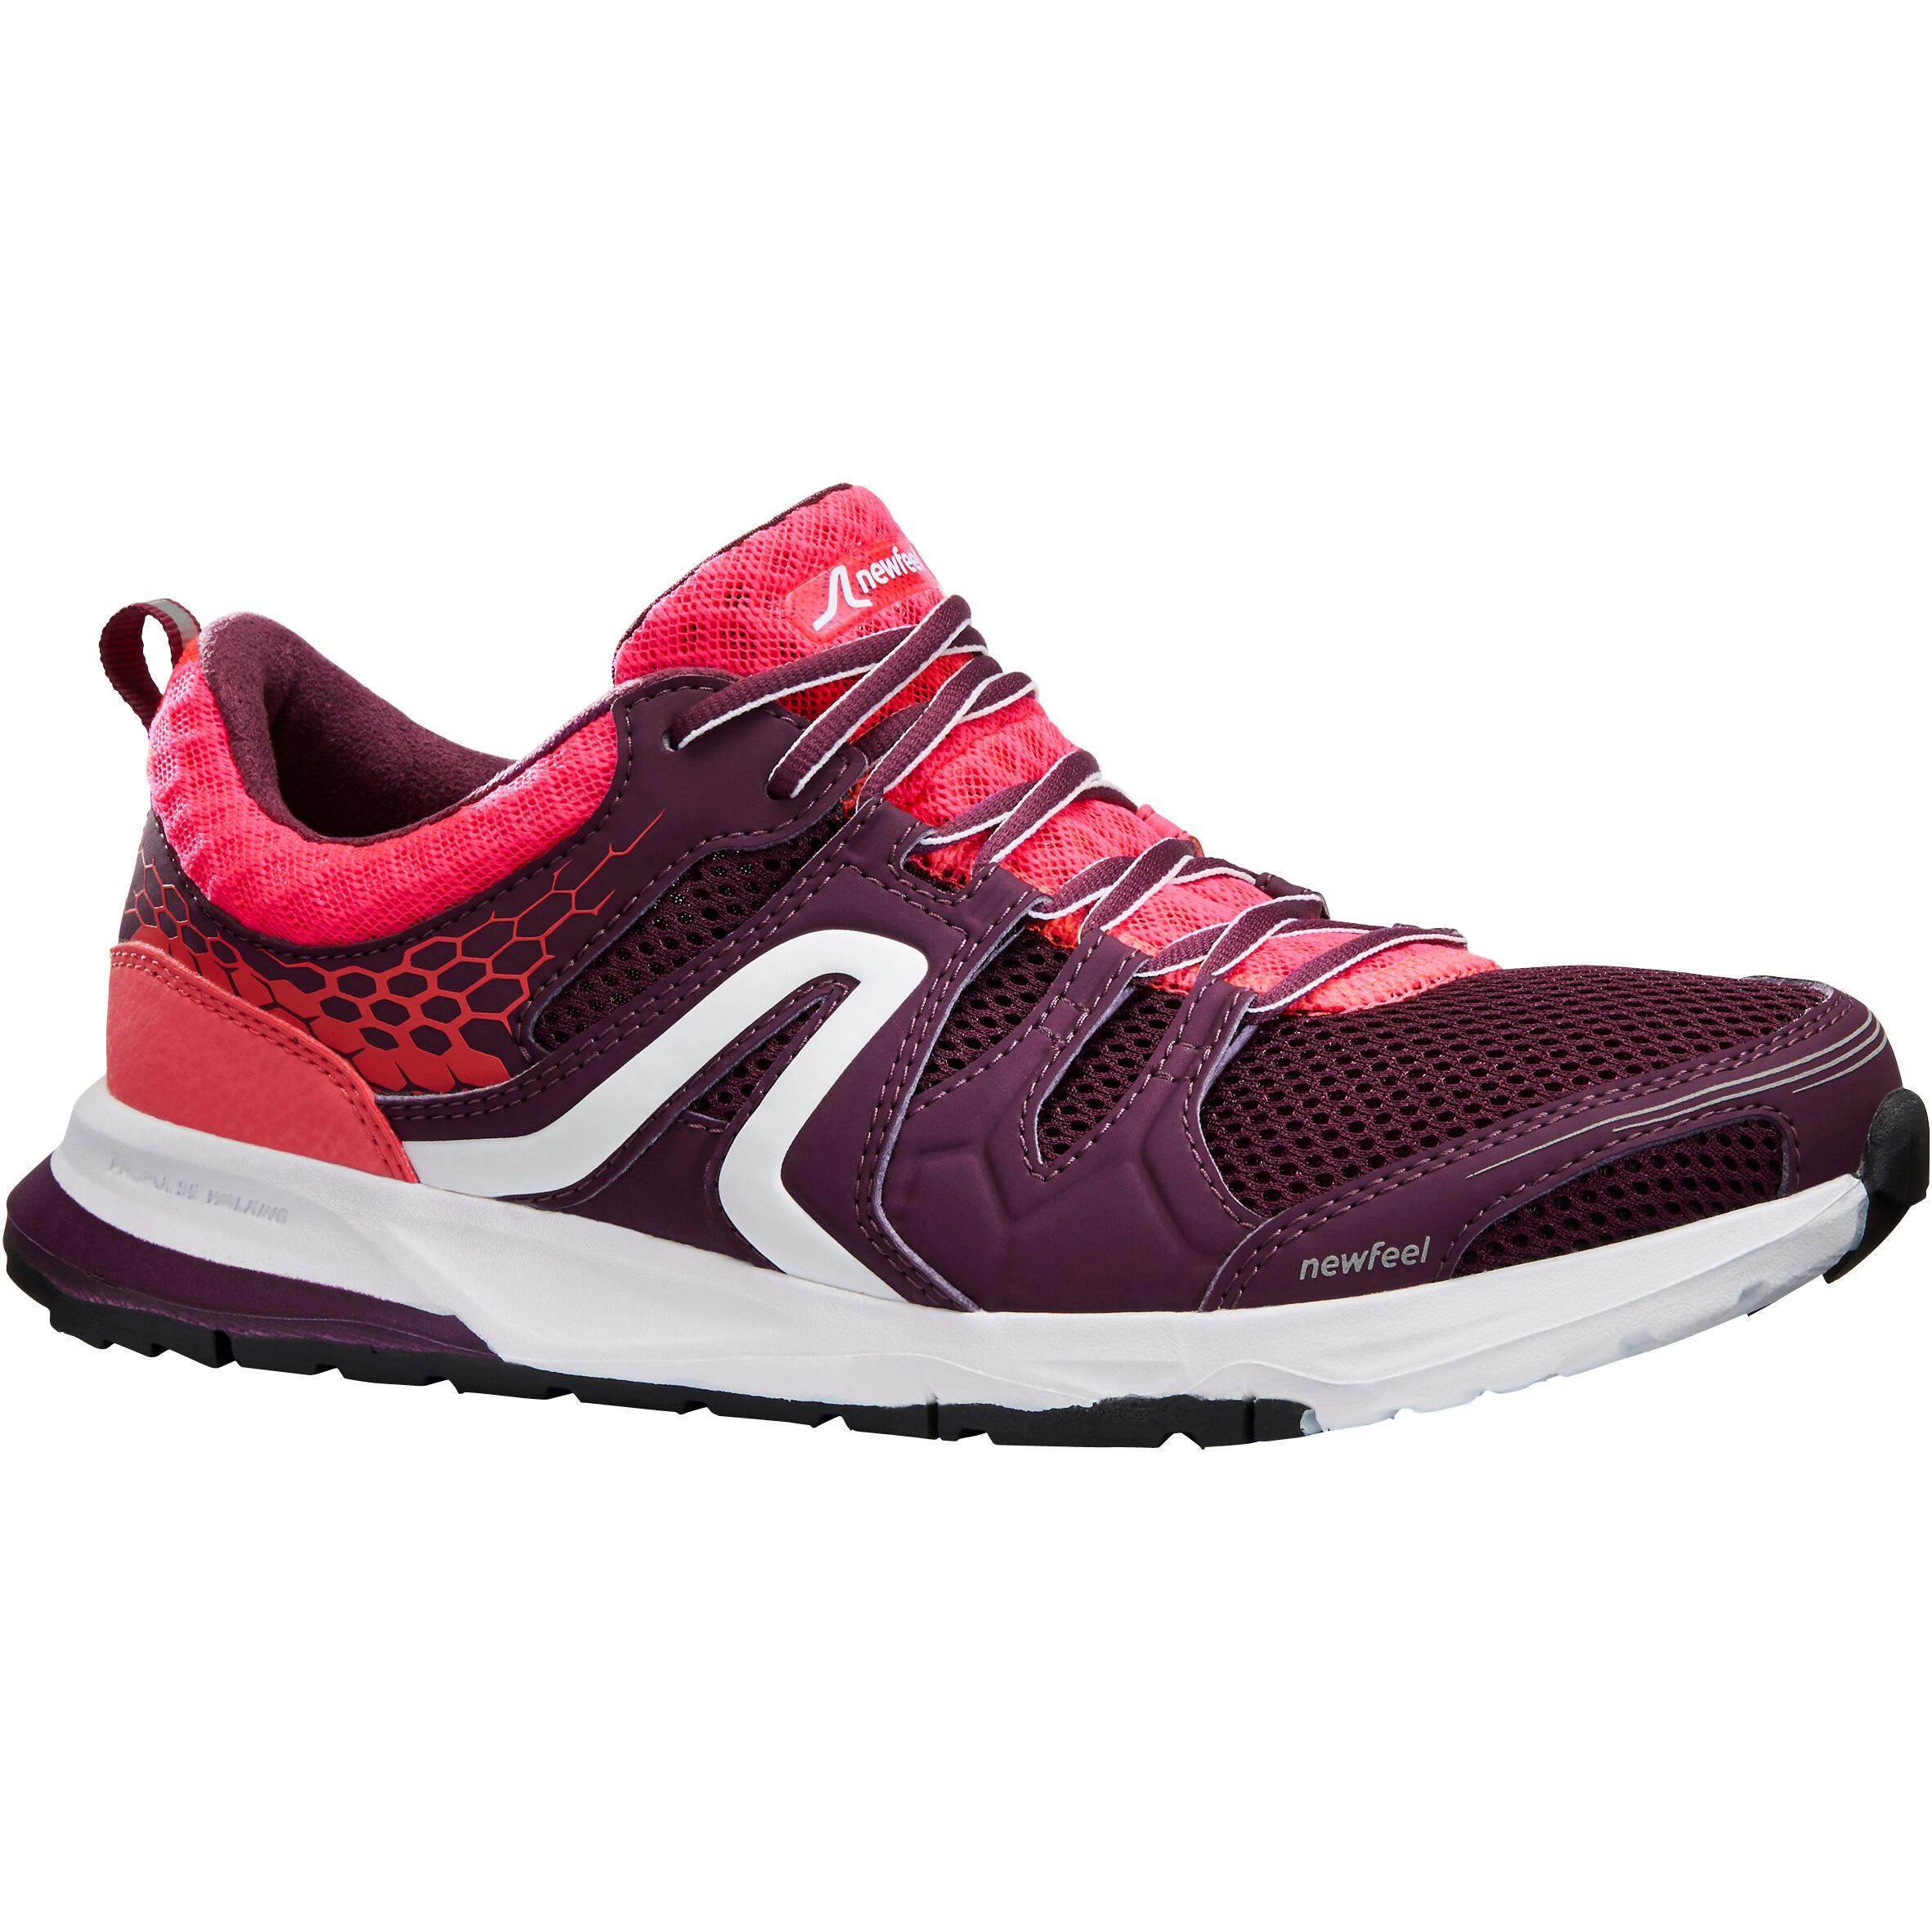 best cheap bd0f2 d7d16 Comprar Zapatillas de Andar para Mujer | Decathlon